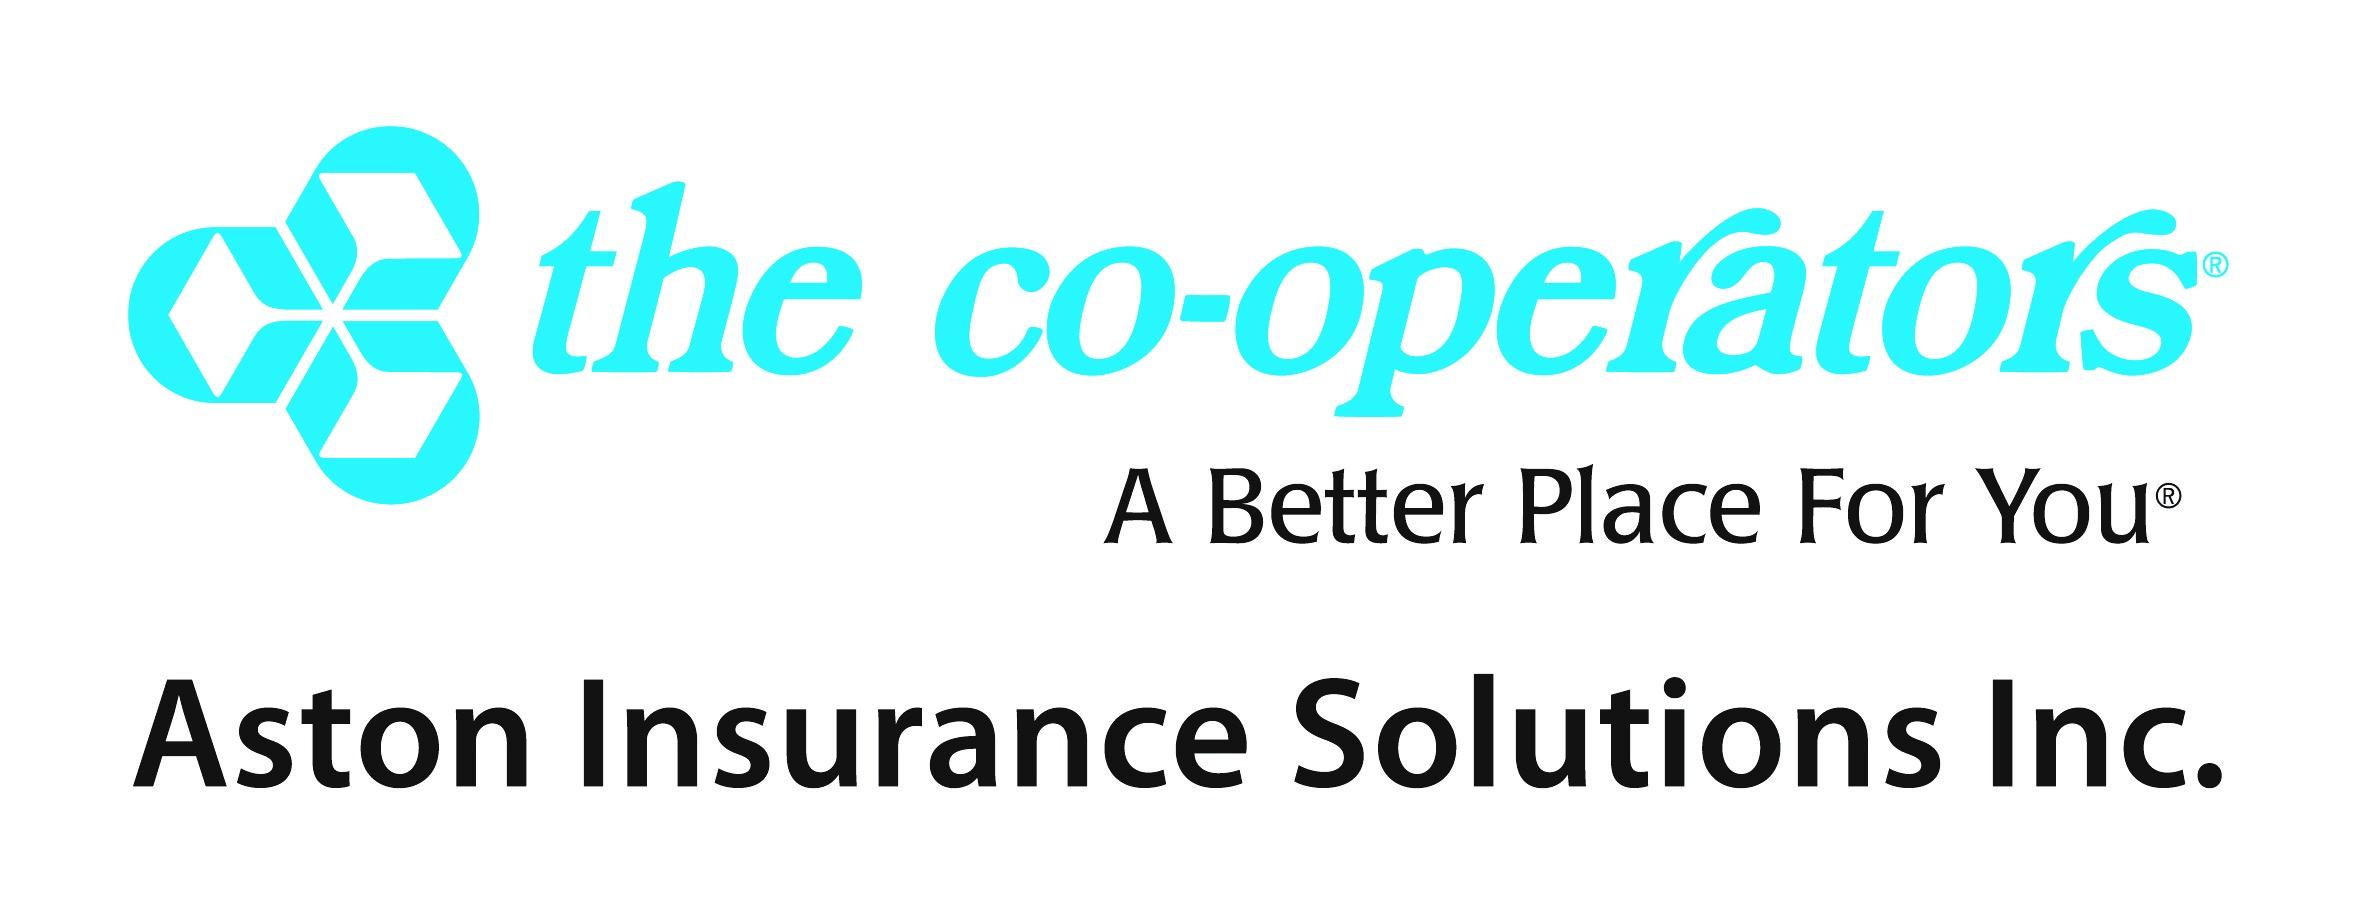 Aston Insurance Solutions Inc.